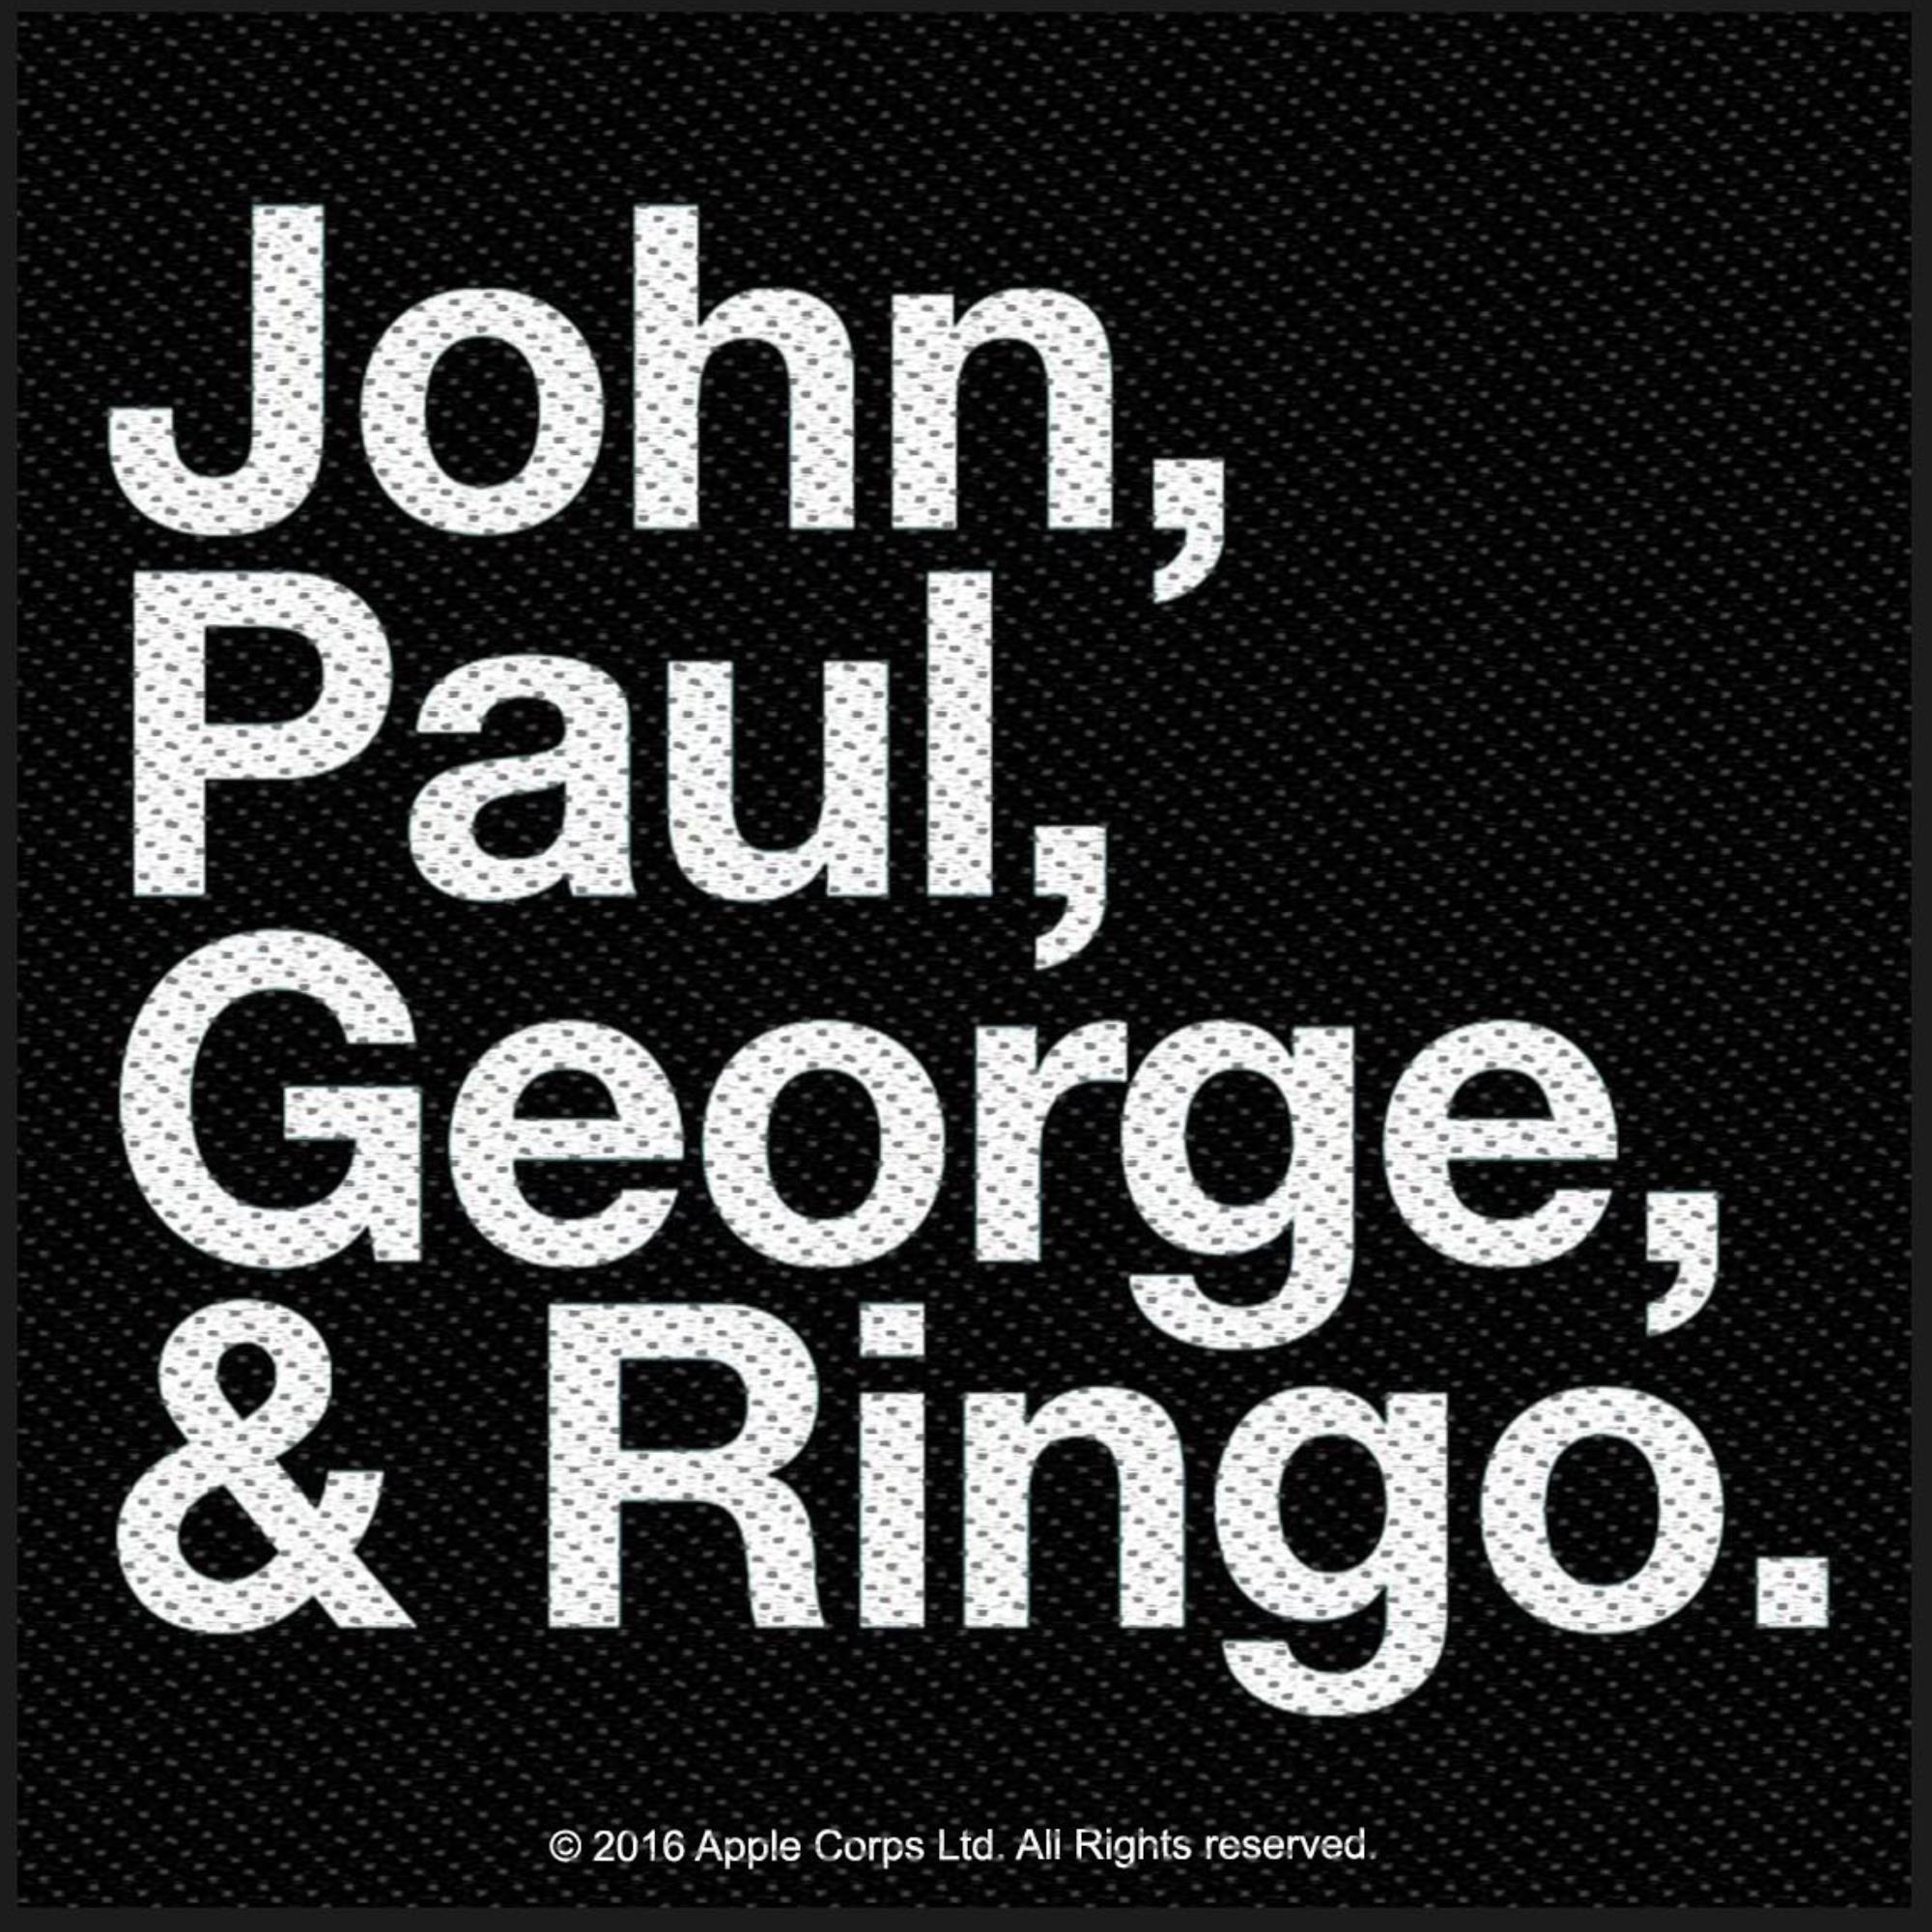 John, Paul, George & Ringo Patch